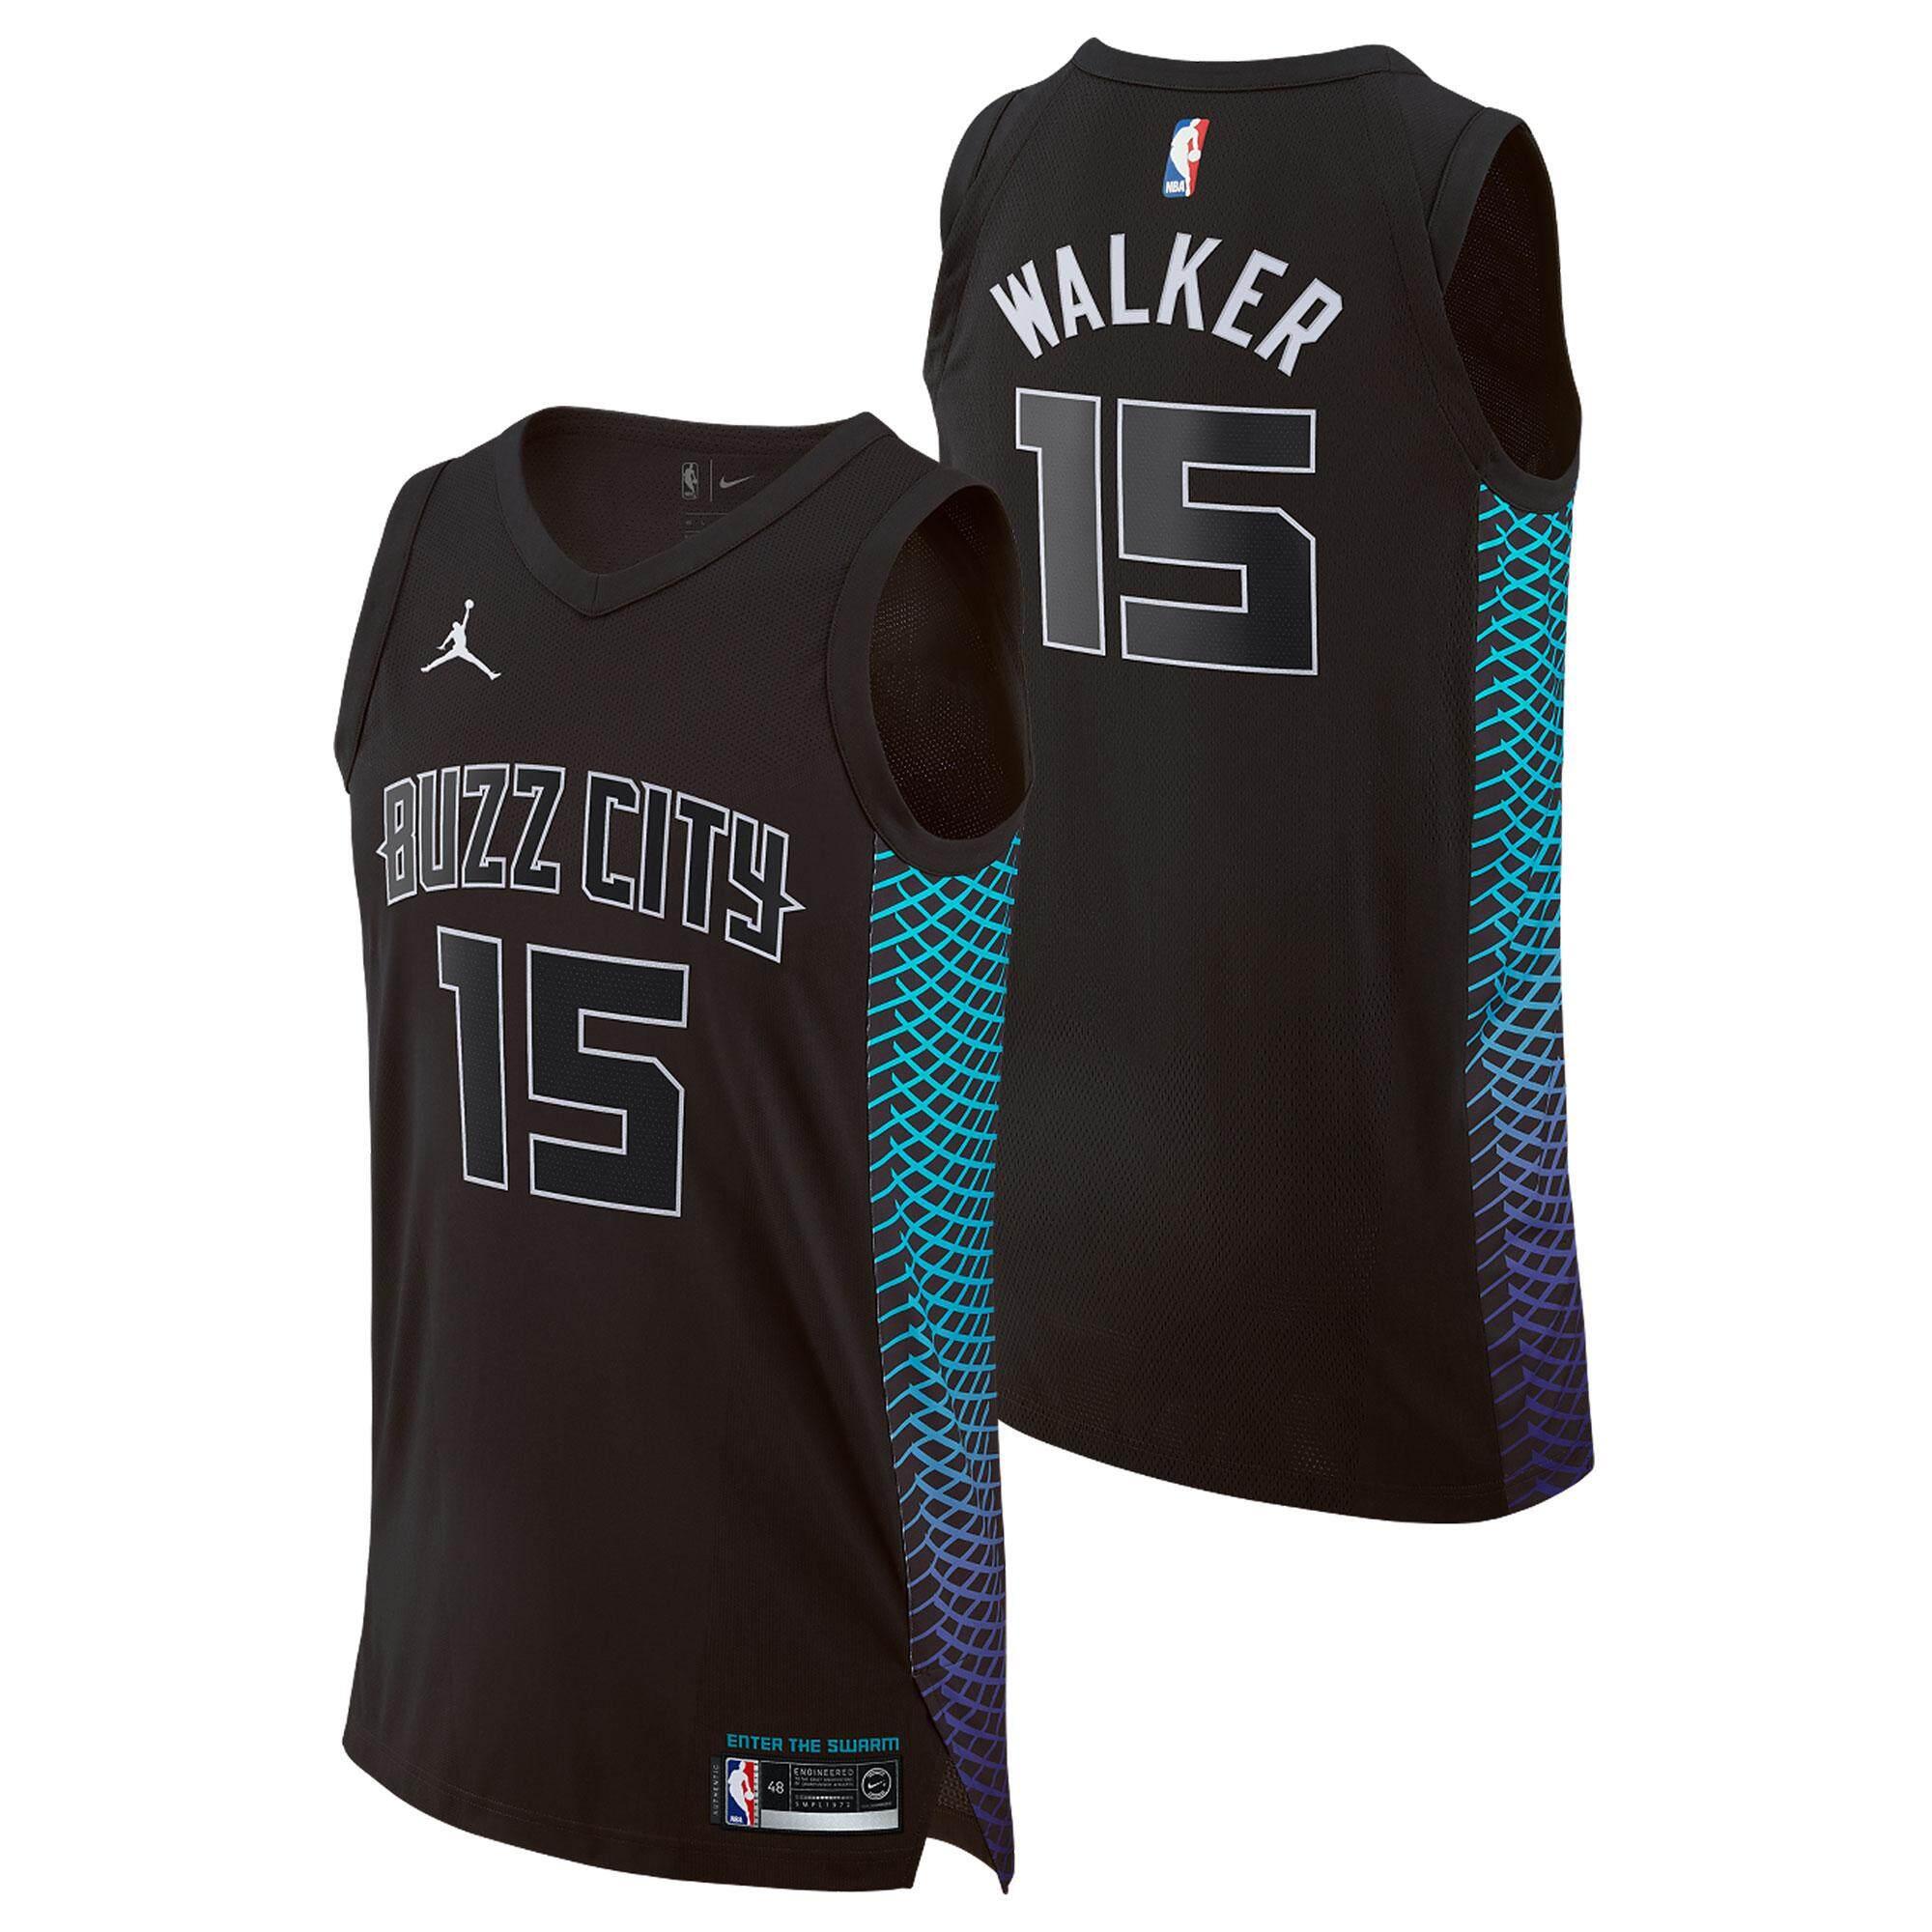 NBA Int S Aqua Hardwood Classics Men s Charlotte Hornets Basketball Clothes  Kemba Walker Num 15 Swingman 4fa9563bf